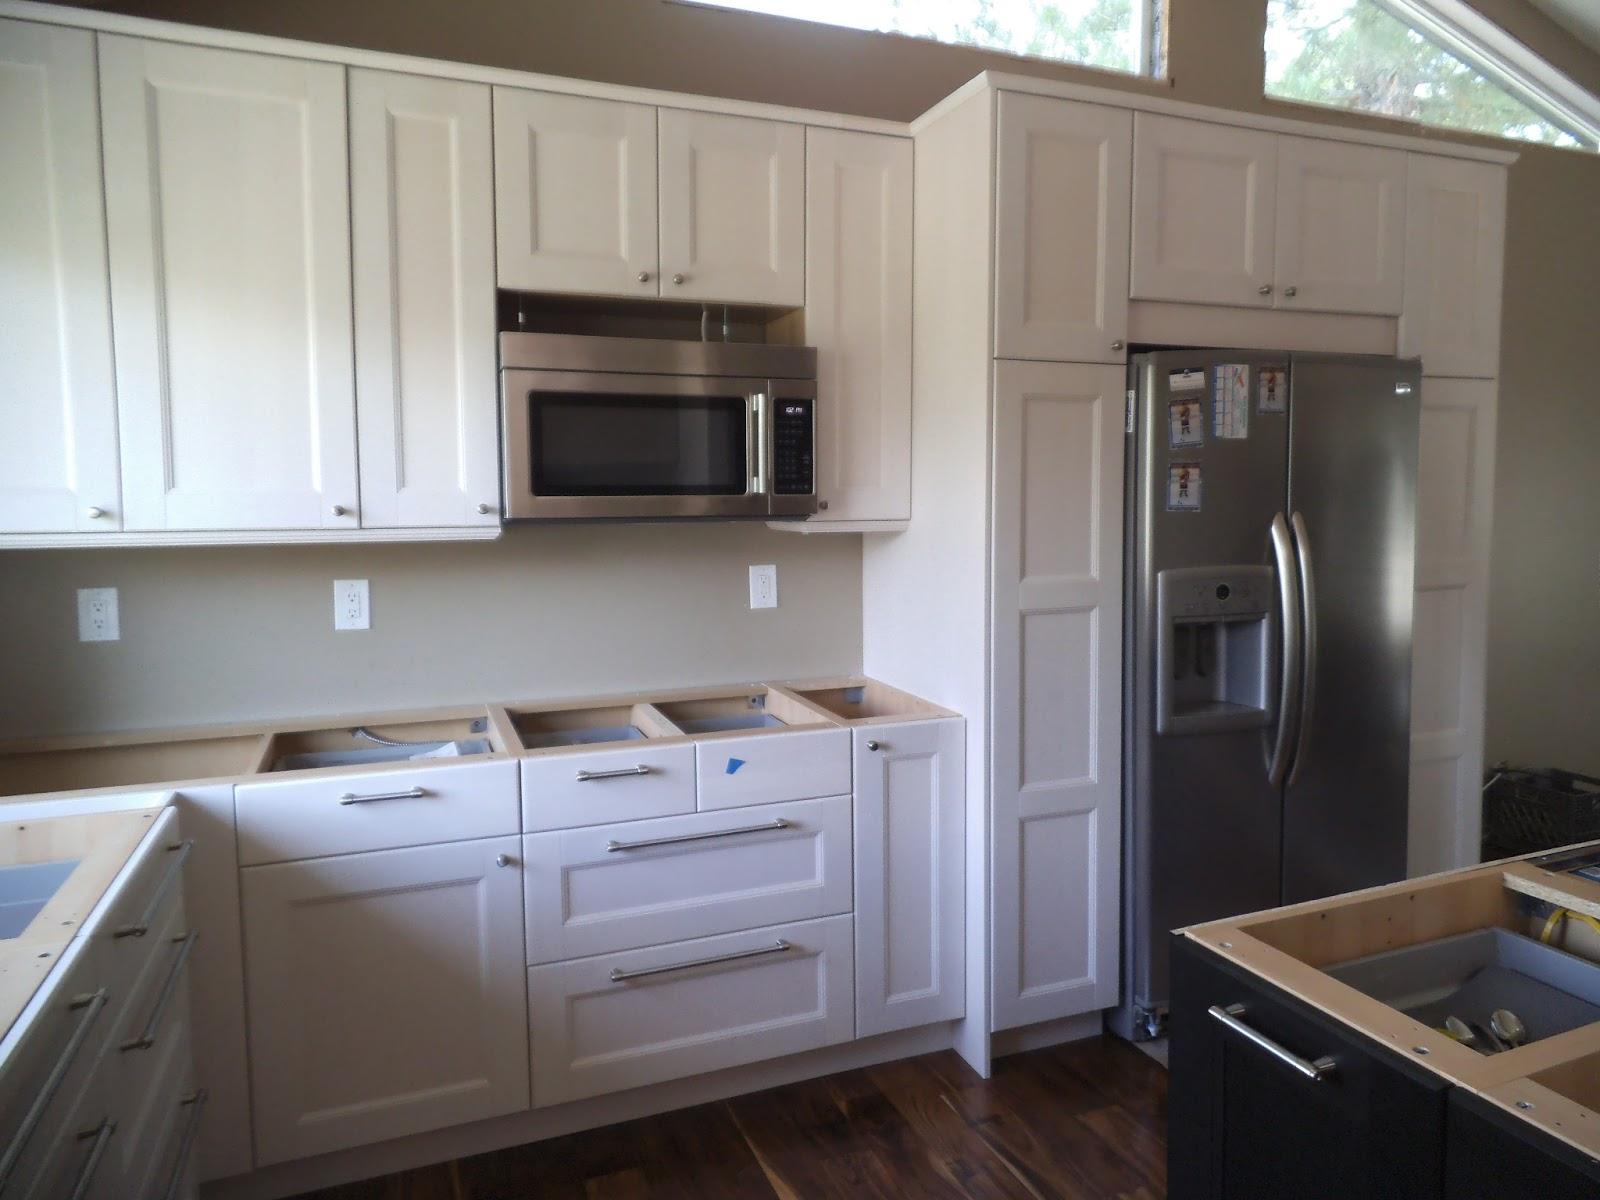 Ikea Kitchen Cabinets For Amazing Kitchen: Stacie's Stuff: My 2 Cents Worth